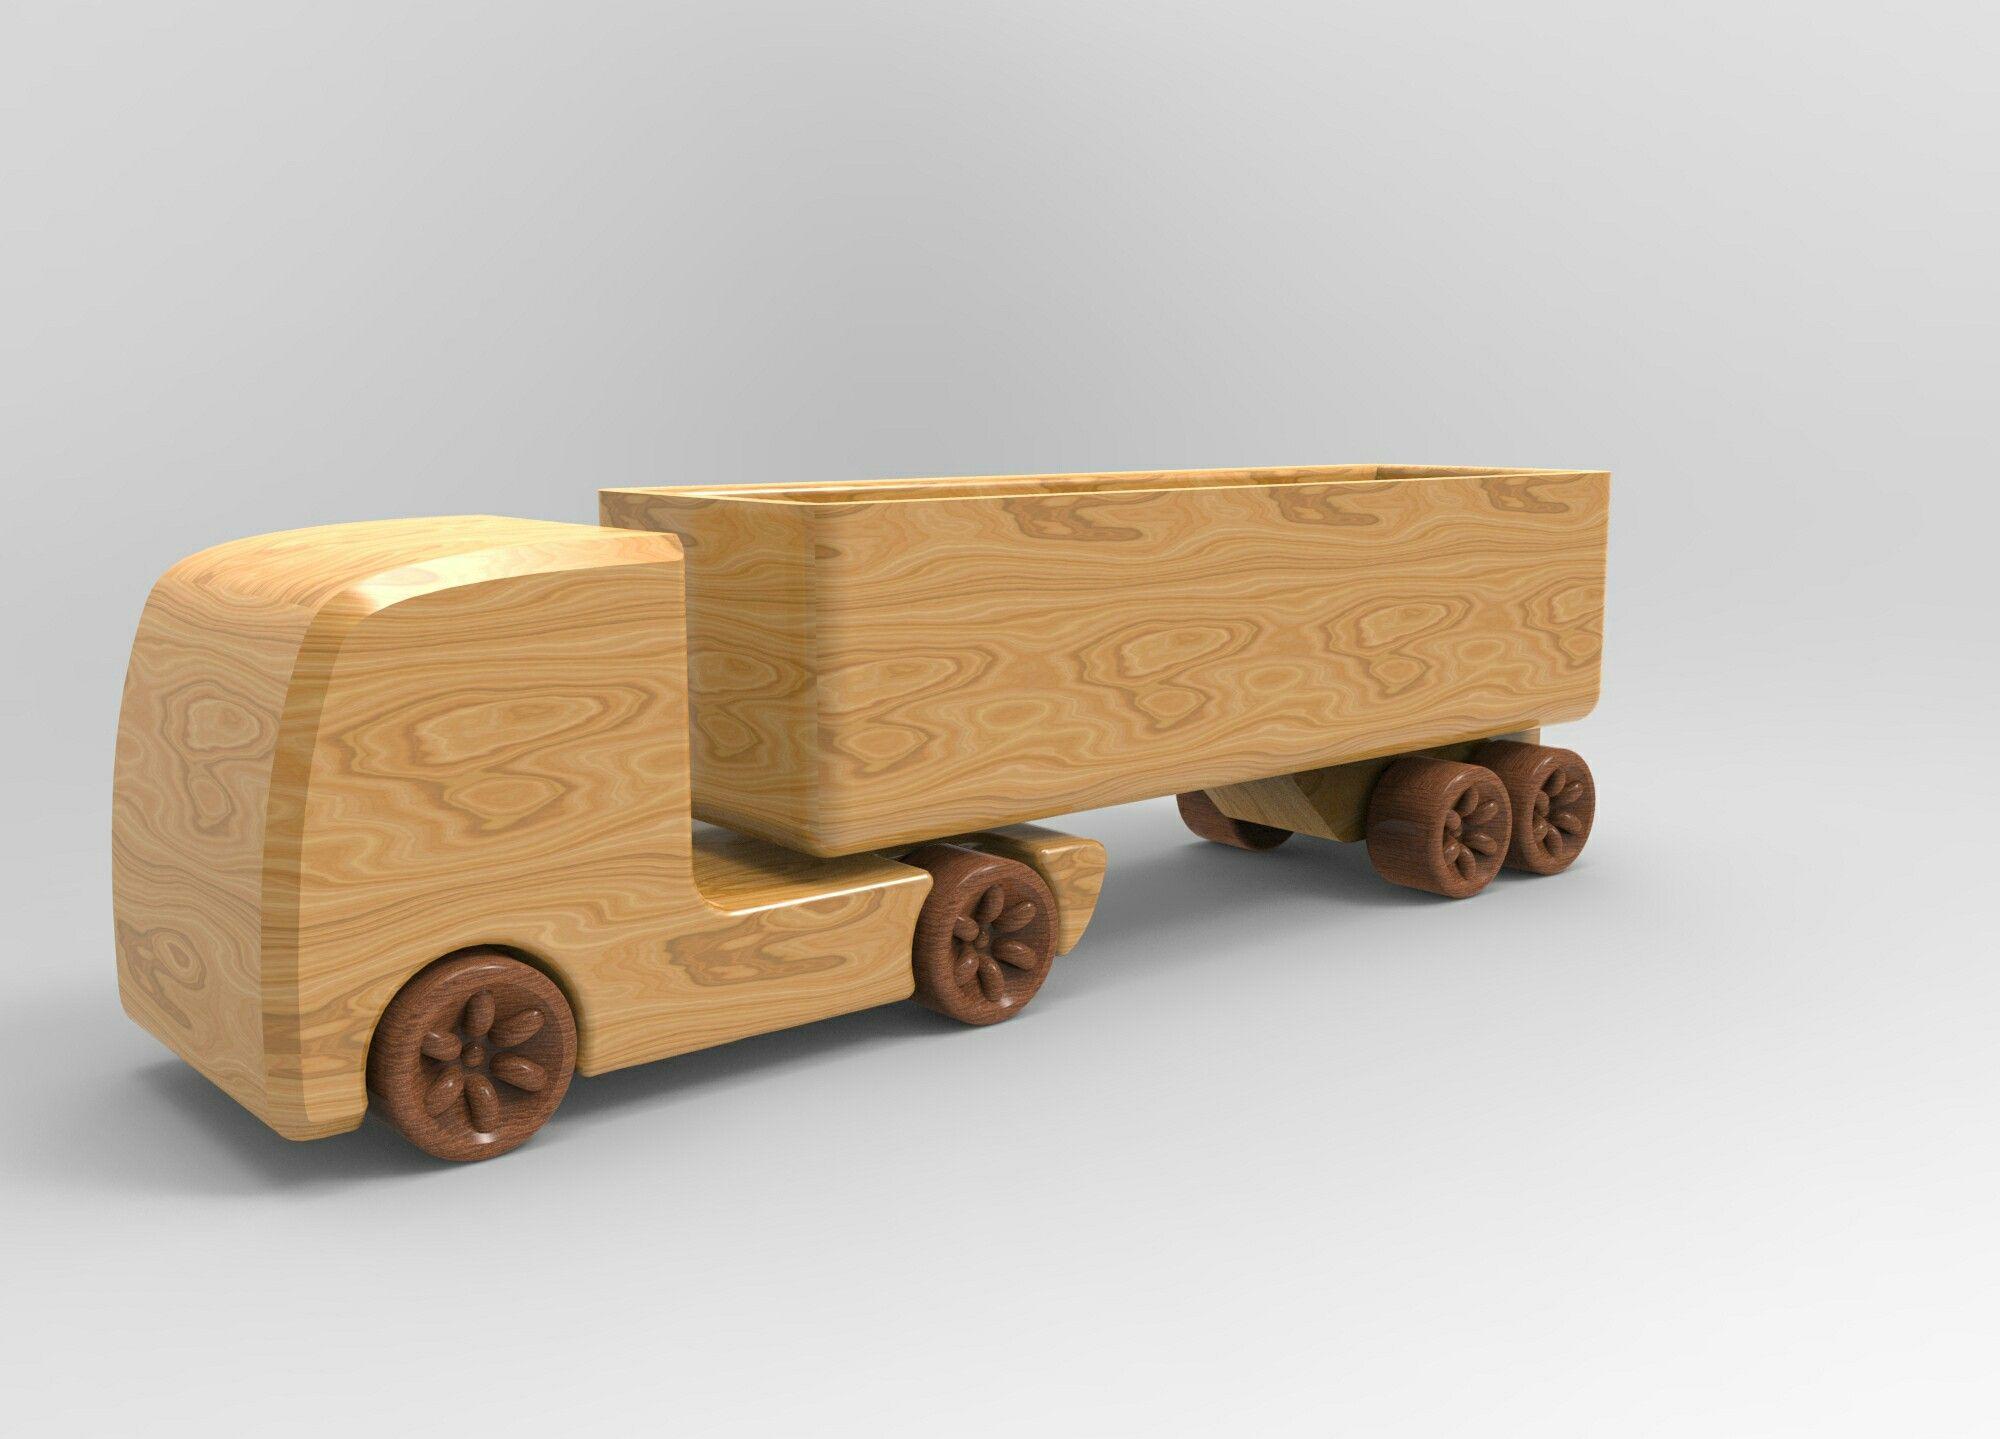 wooden truck toy design / industrial design. | wooden toys